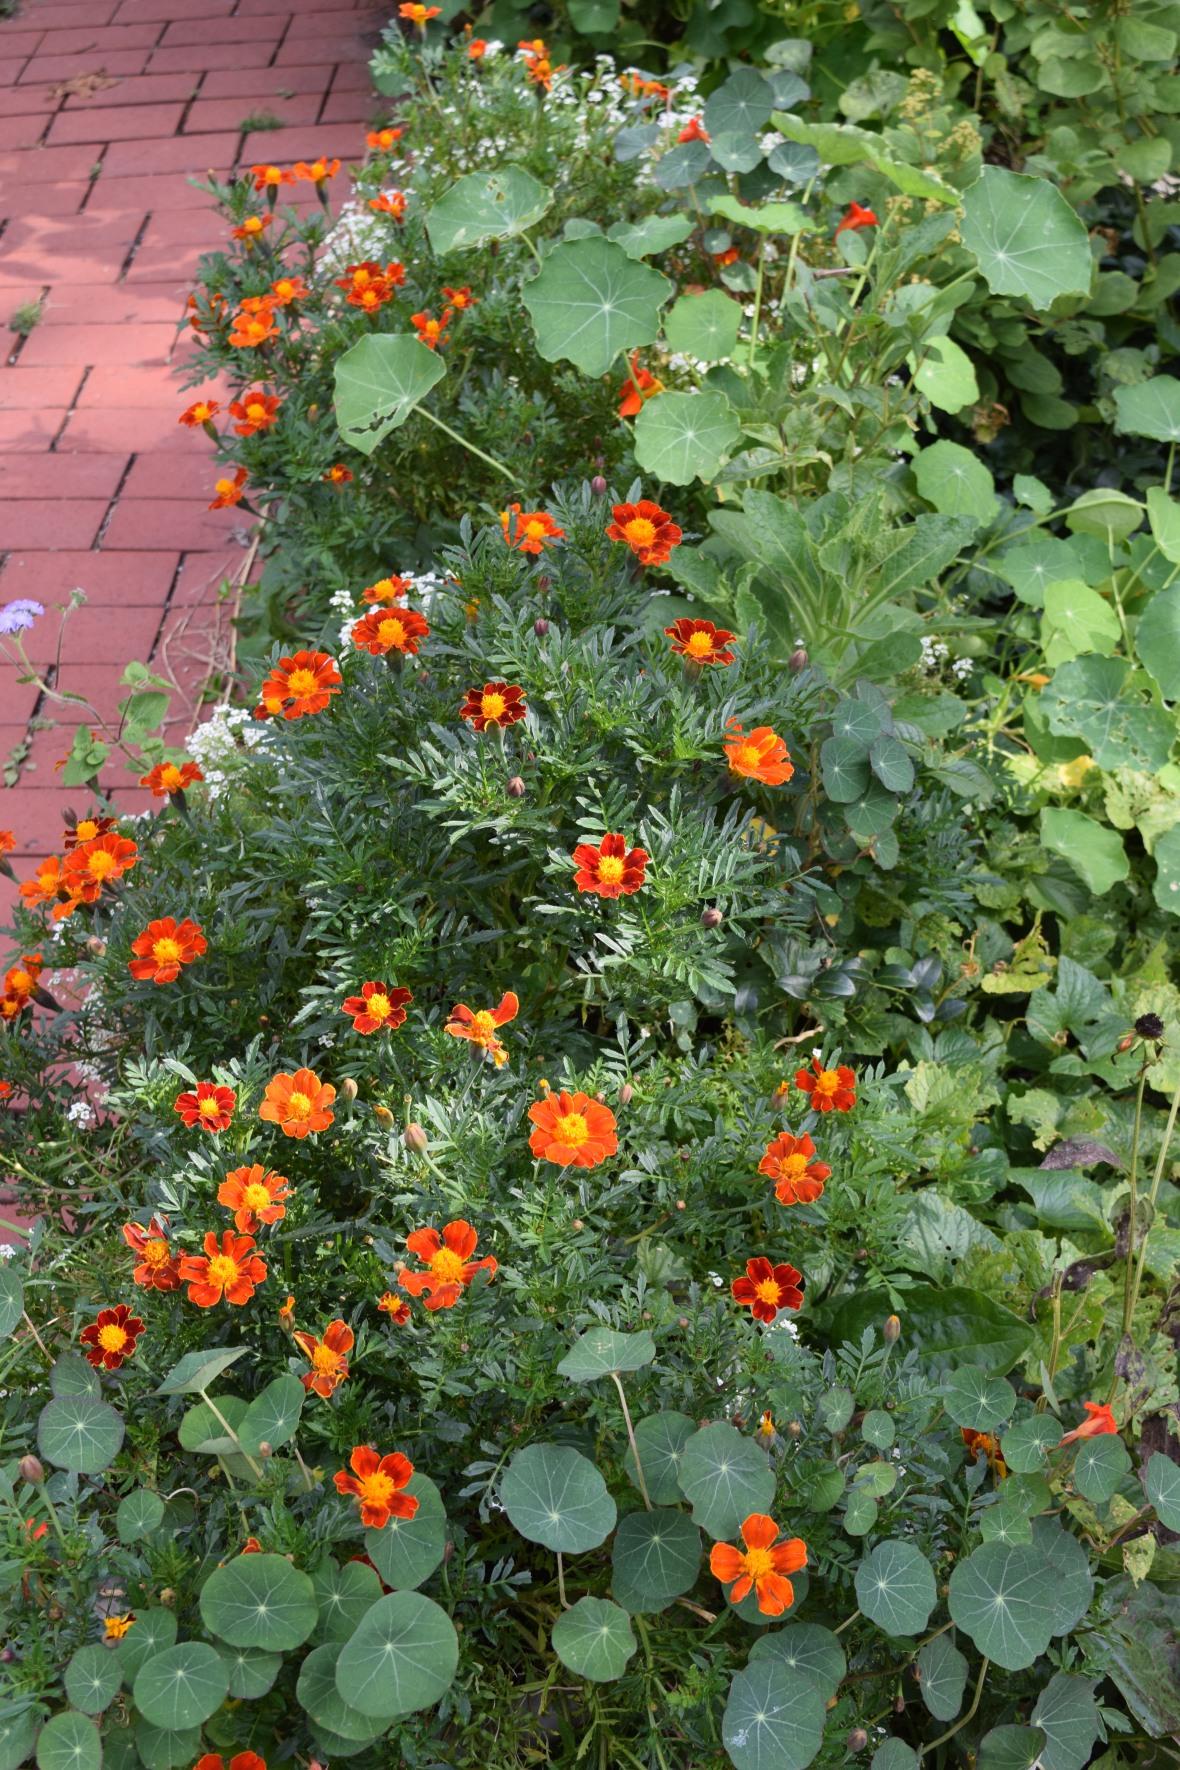 DSC_0470 marigolds